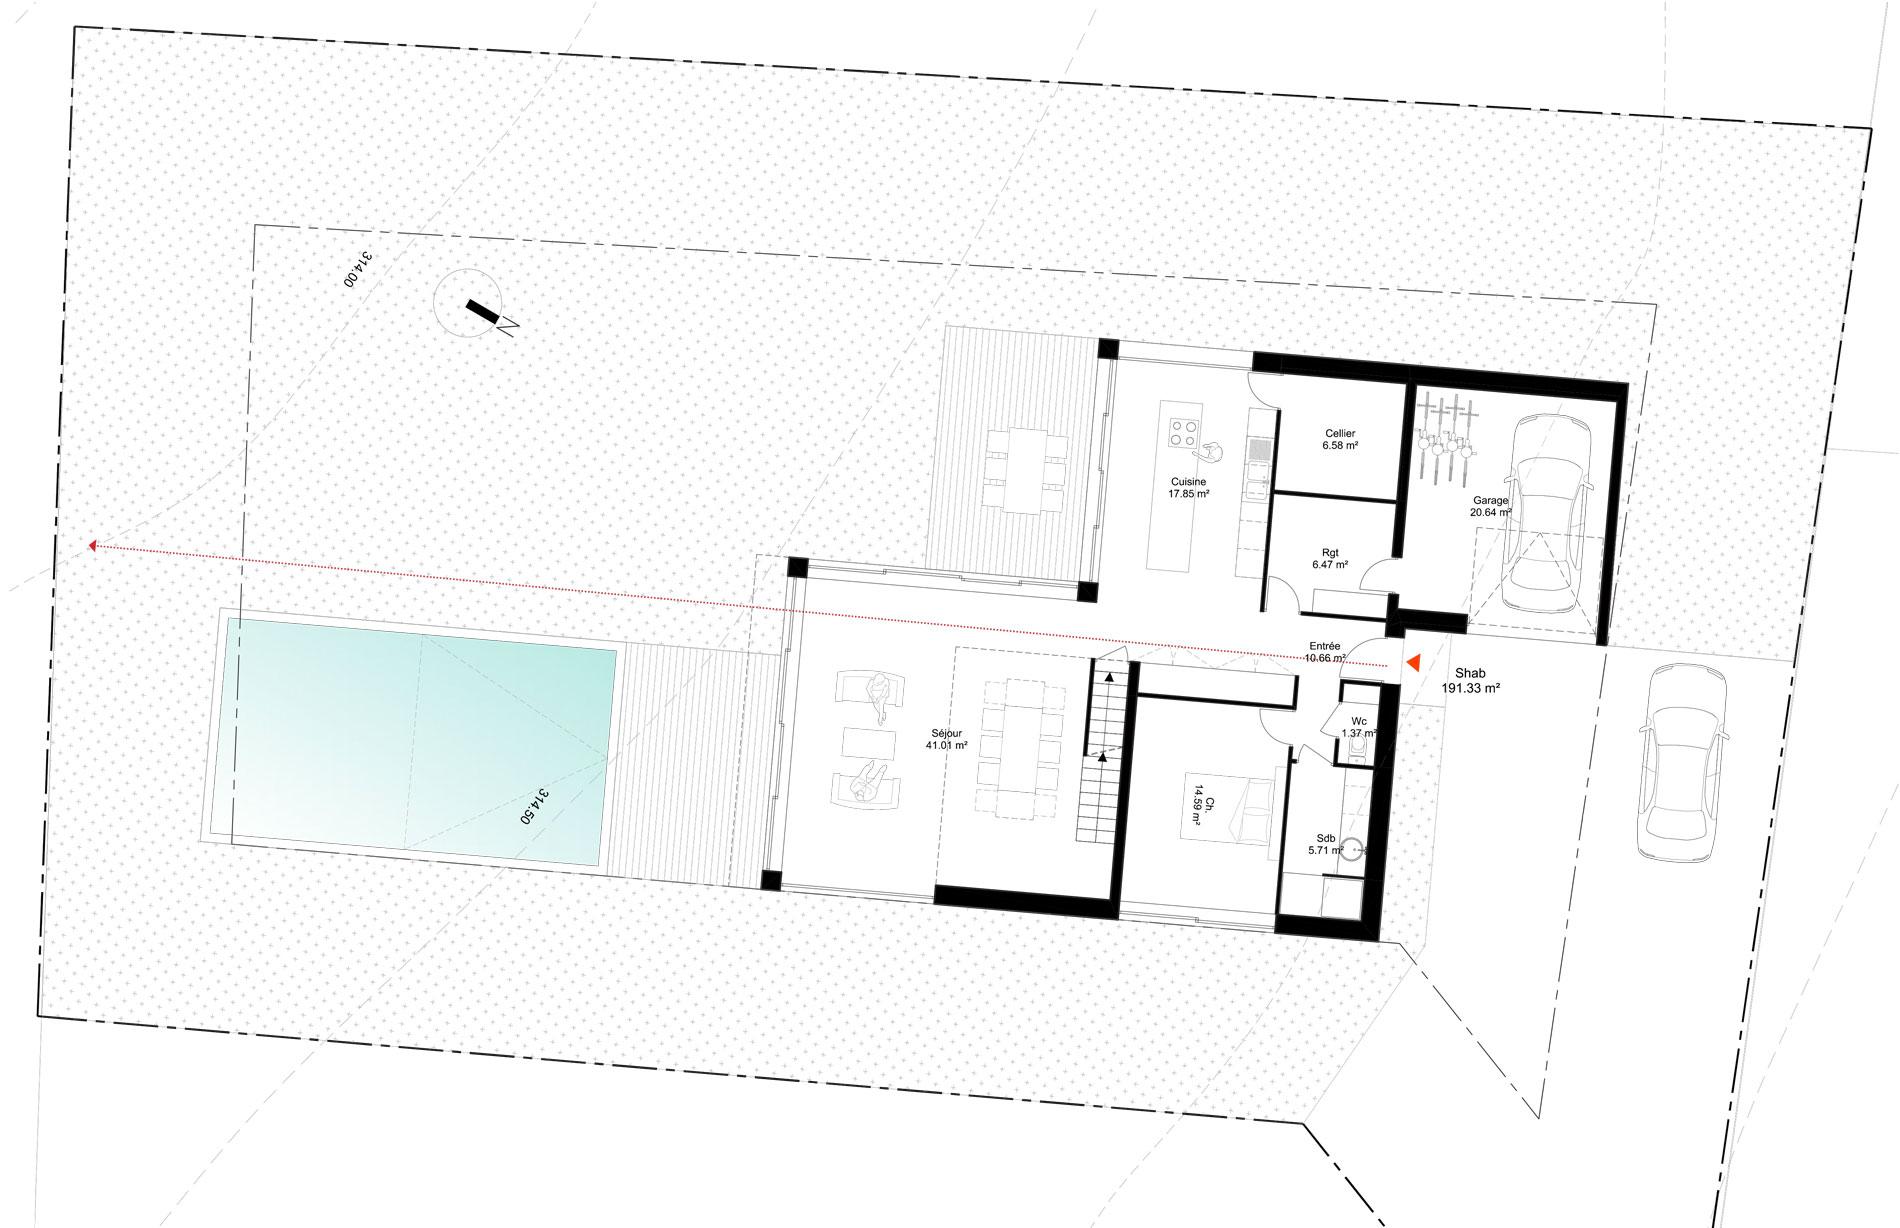 asb-architecture-maison-contemporaine-toiture-terrasse-plan-rdc